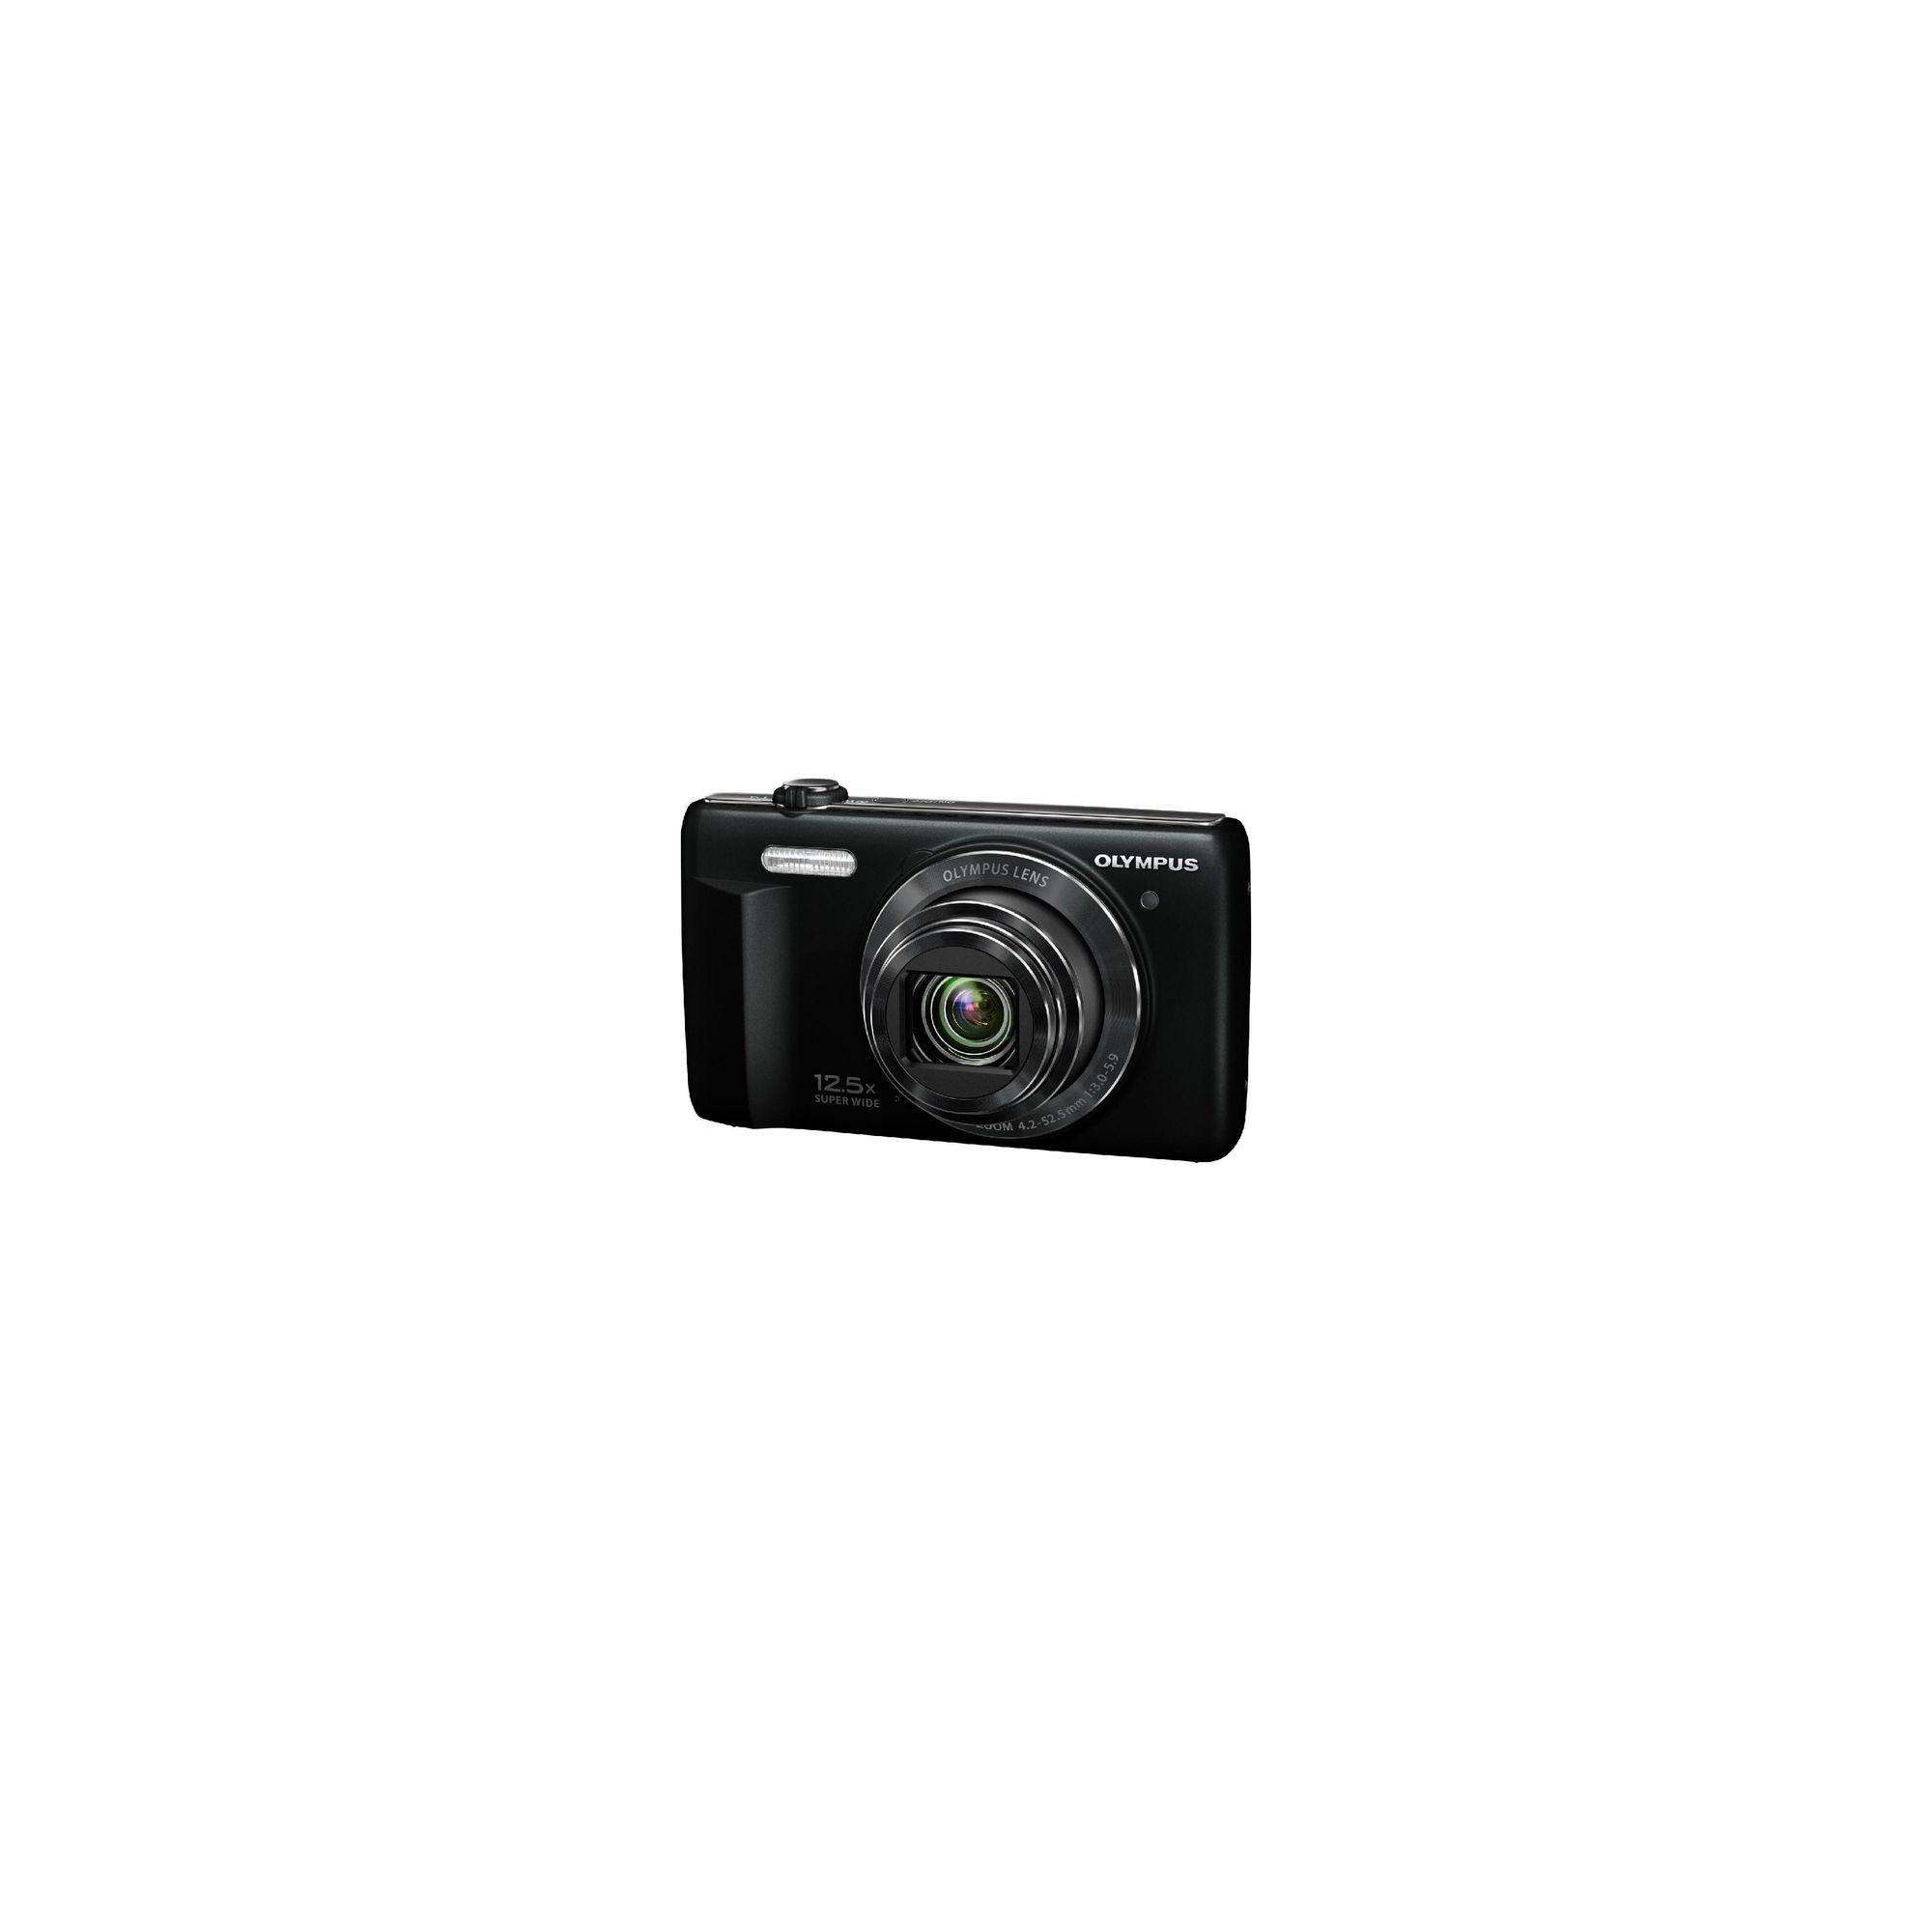 VR-370 Compact Digital Camera